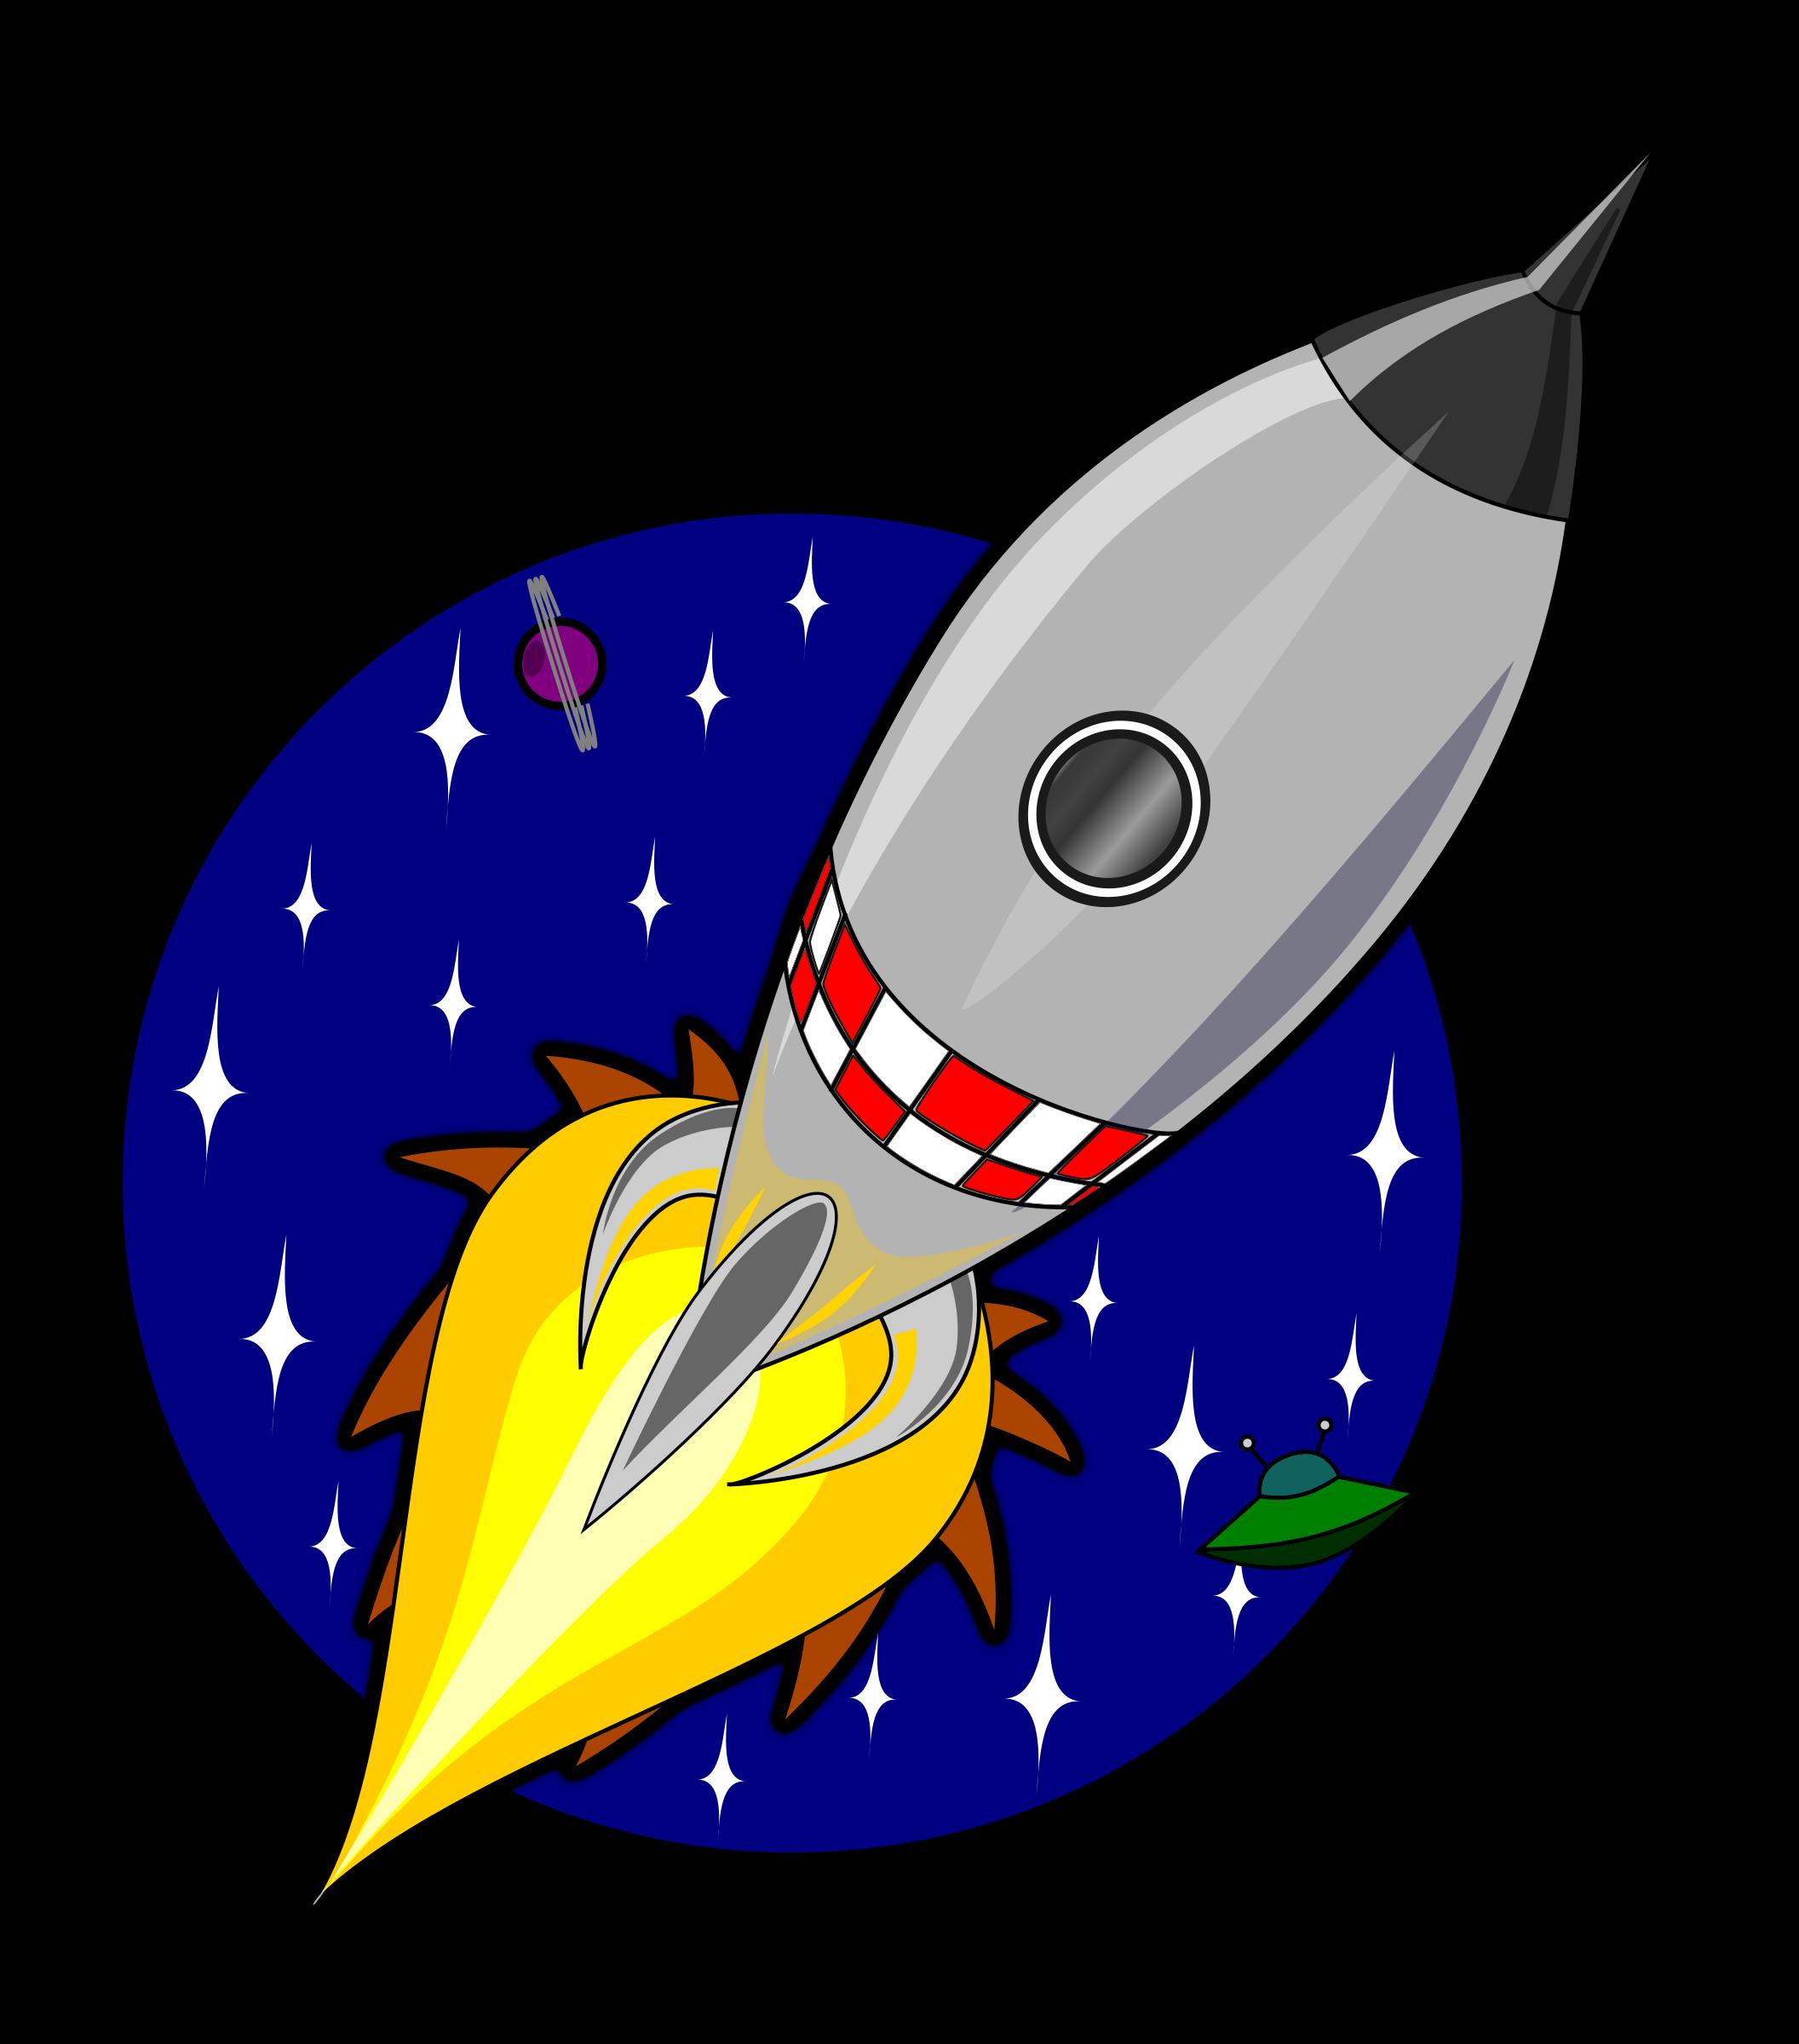 Animation of Kliponius-Cartoon-rocket using JavaScript  A